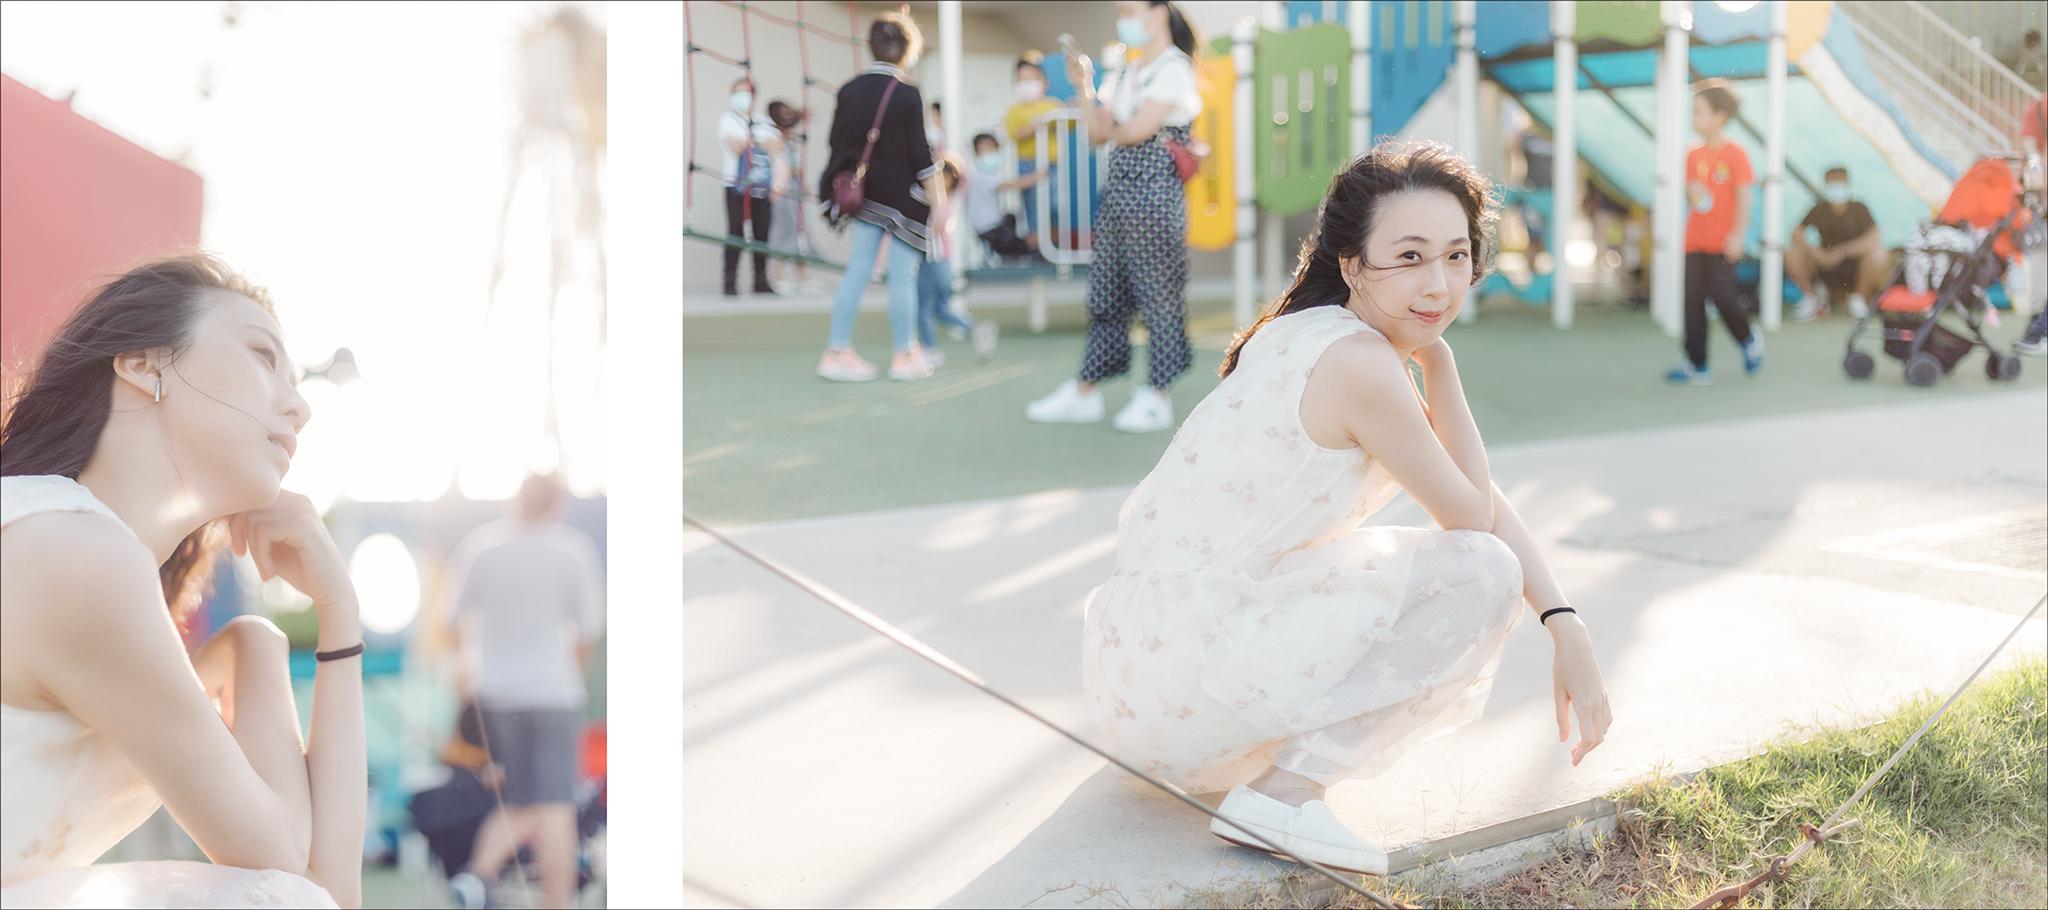 50476361087 b27eb83136 o - 【寫真】+Melody+EP2